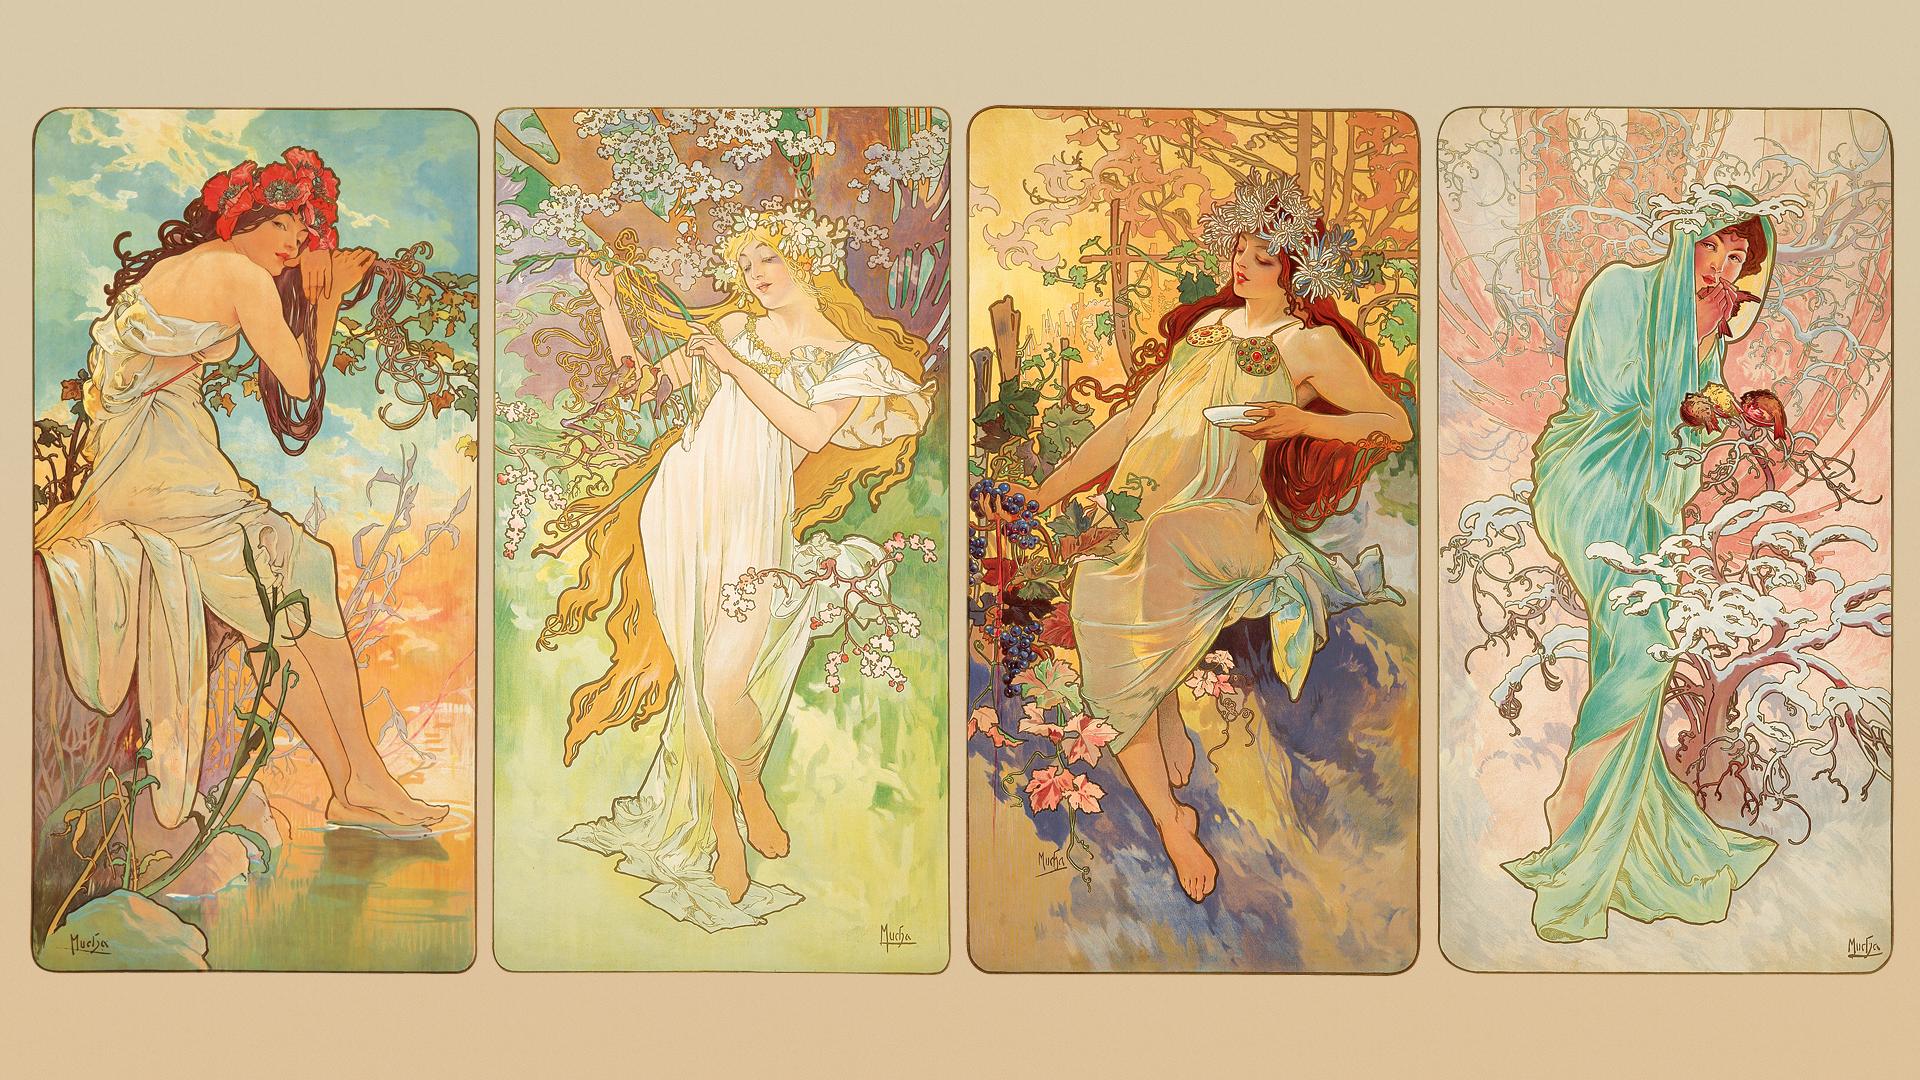 General 1920x1080 Alphonse Mucha Art Nouveau illustration traditional art